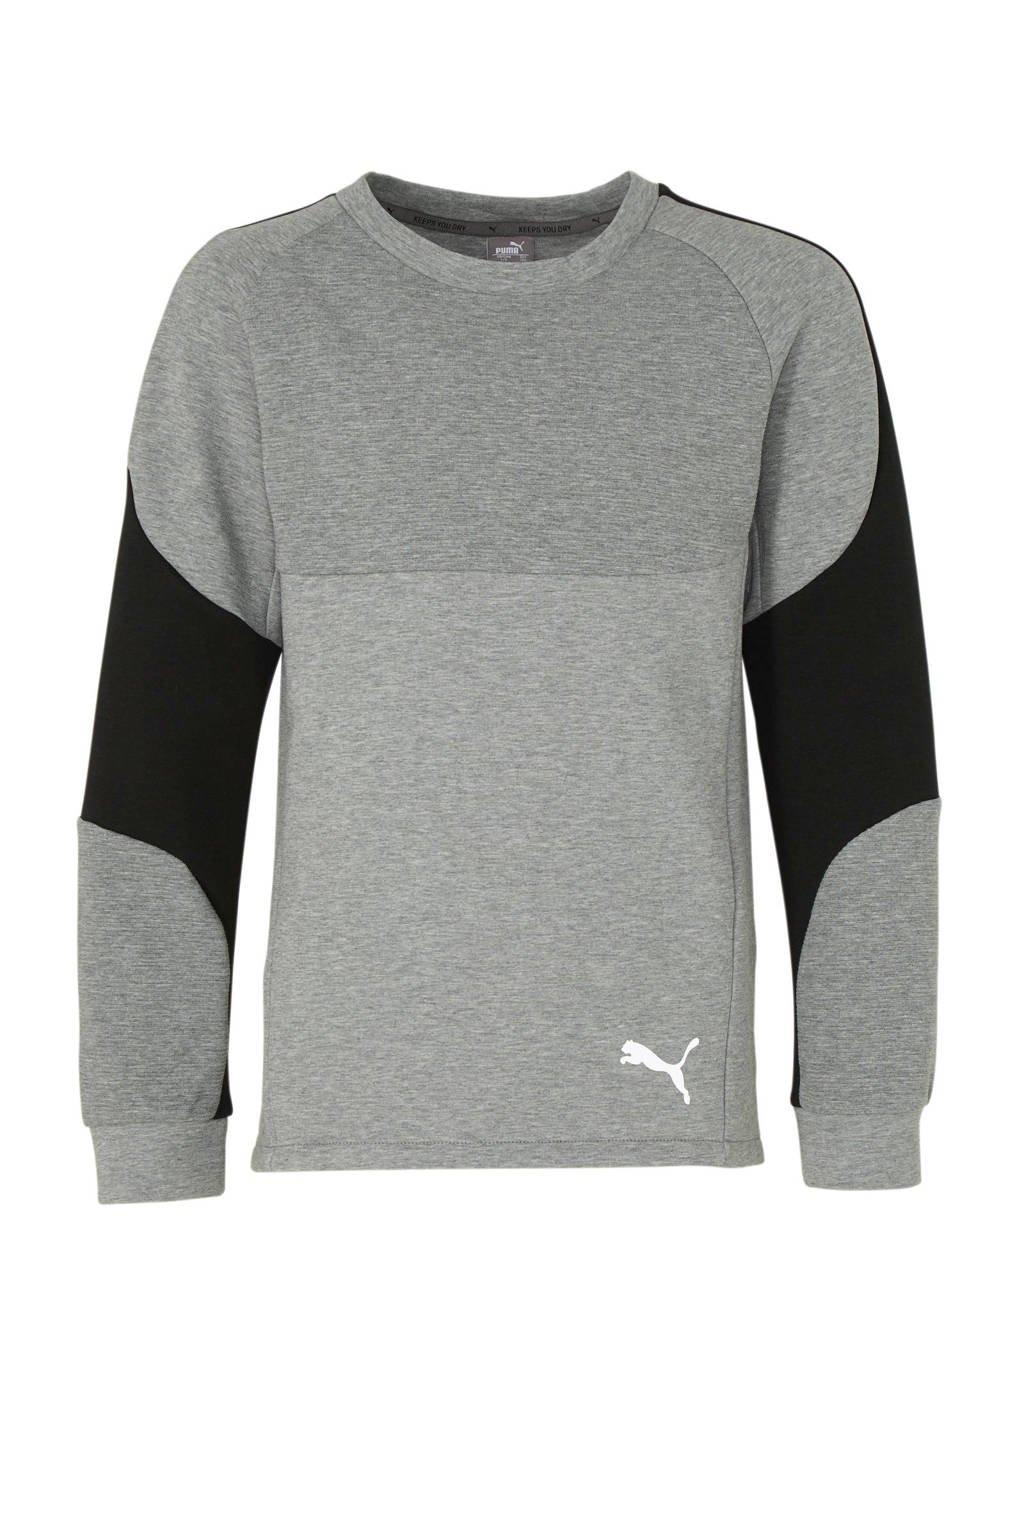 Puma   sportsweater grijs/zwart, Grijs melange/zwart